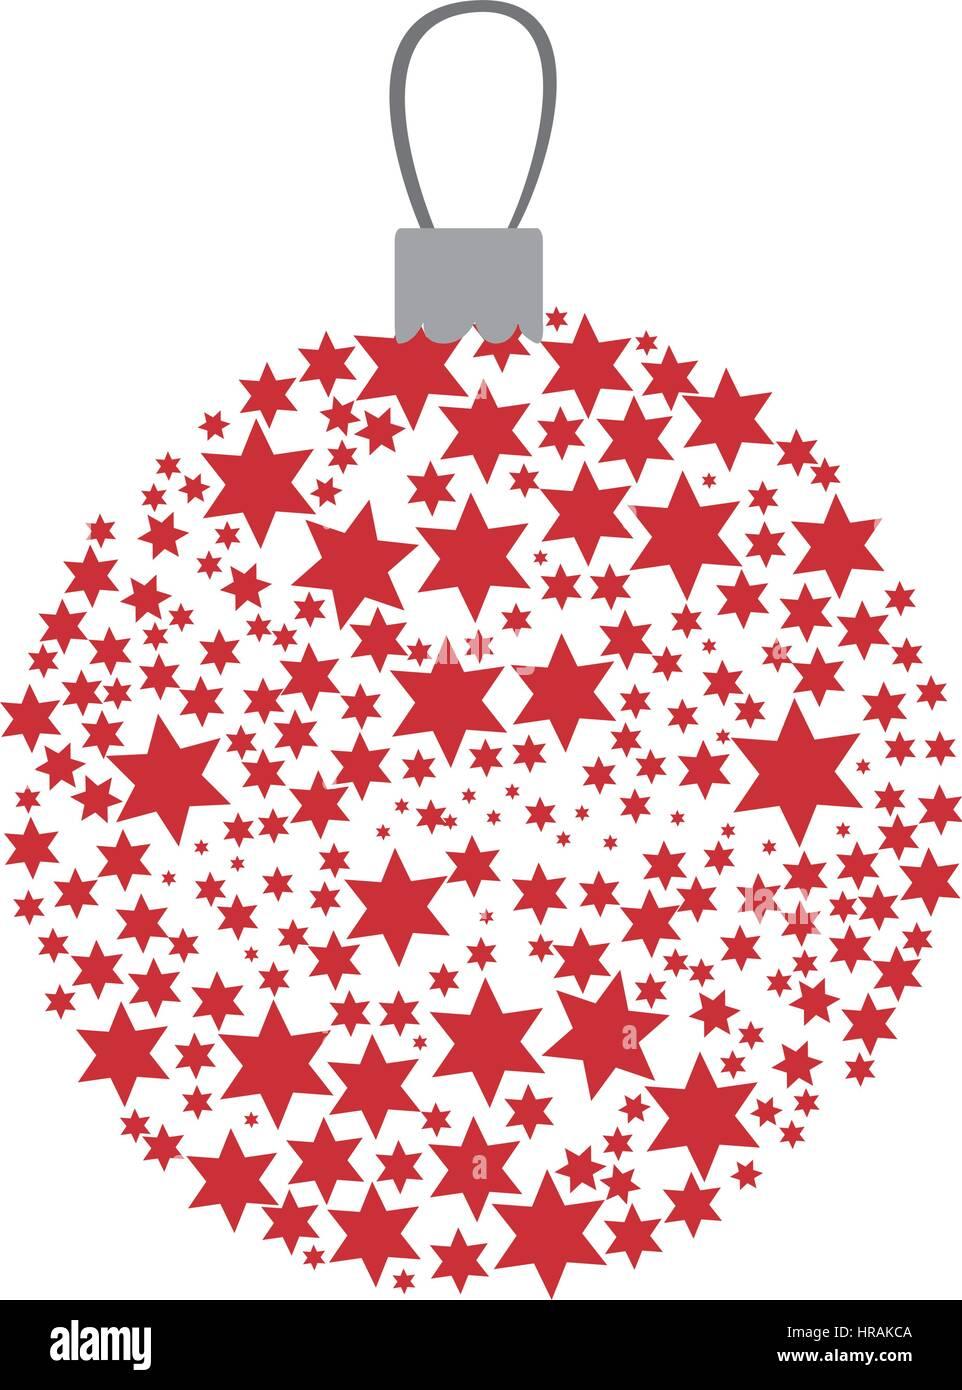 Christmas Star Illustration Stock Photos & Christmas Star ...